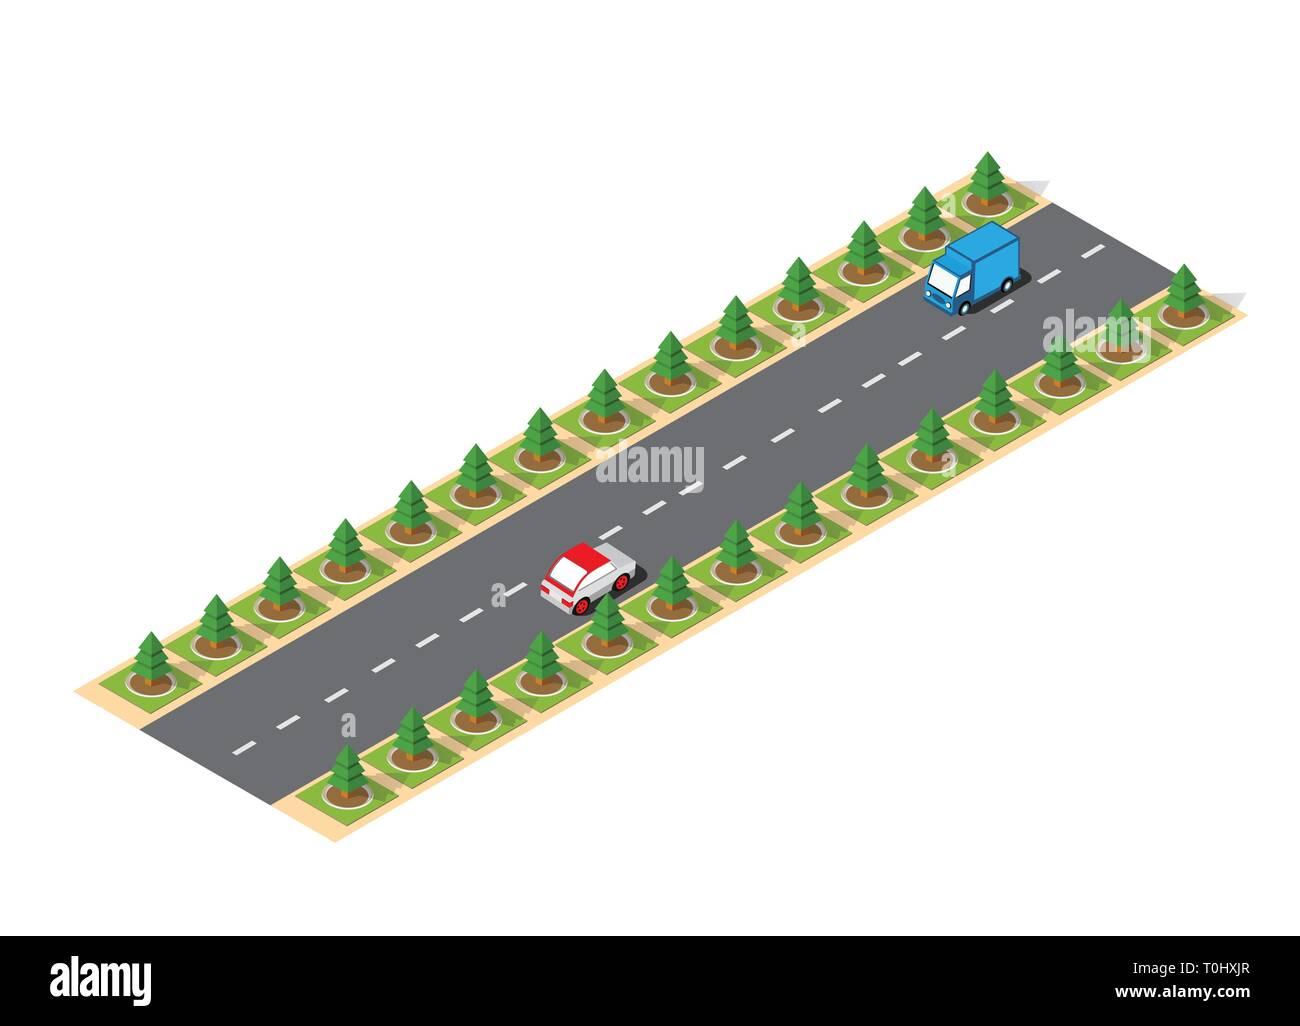 Suburban high-speed isometric - Stock Image